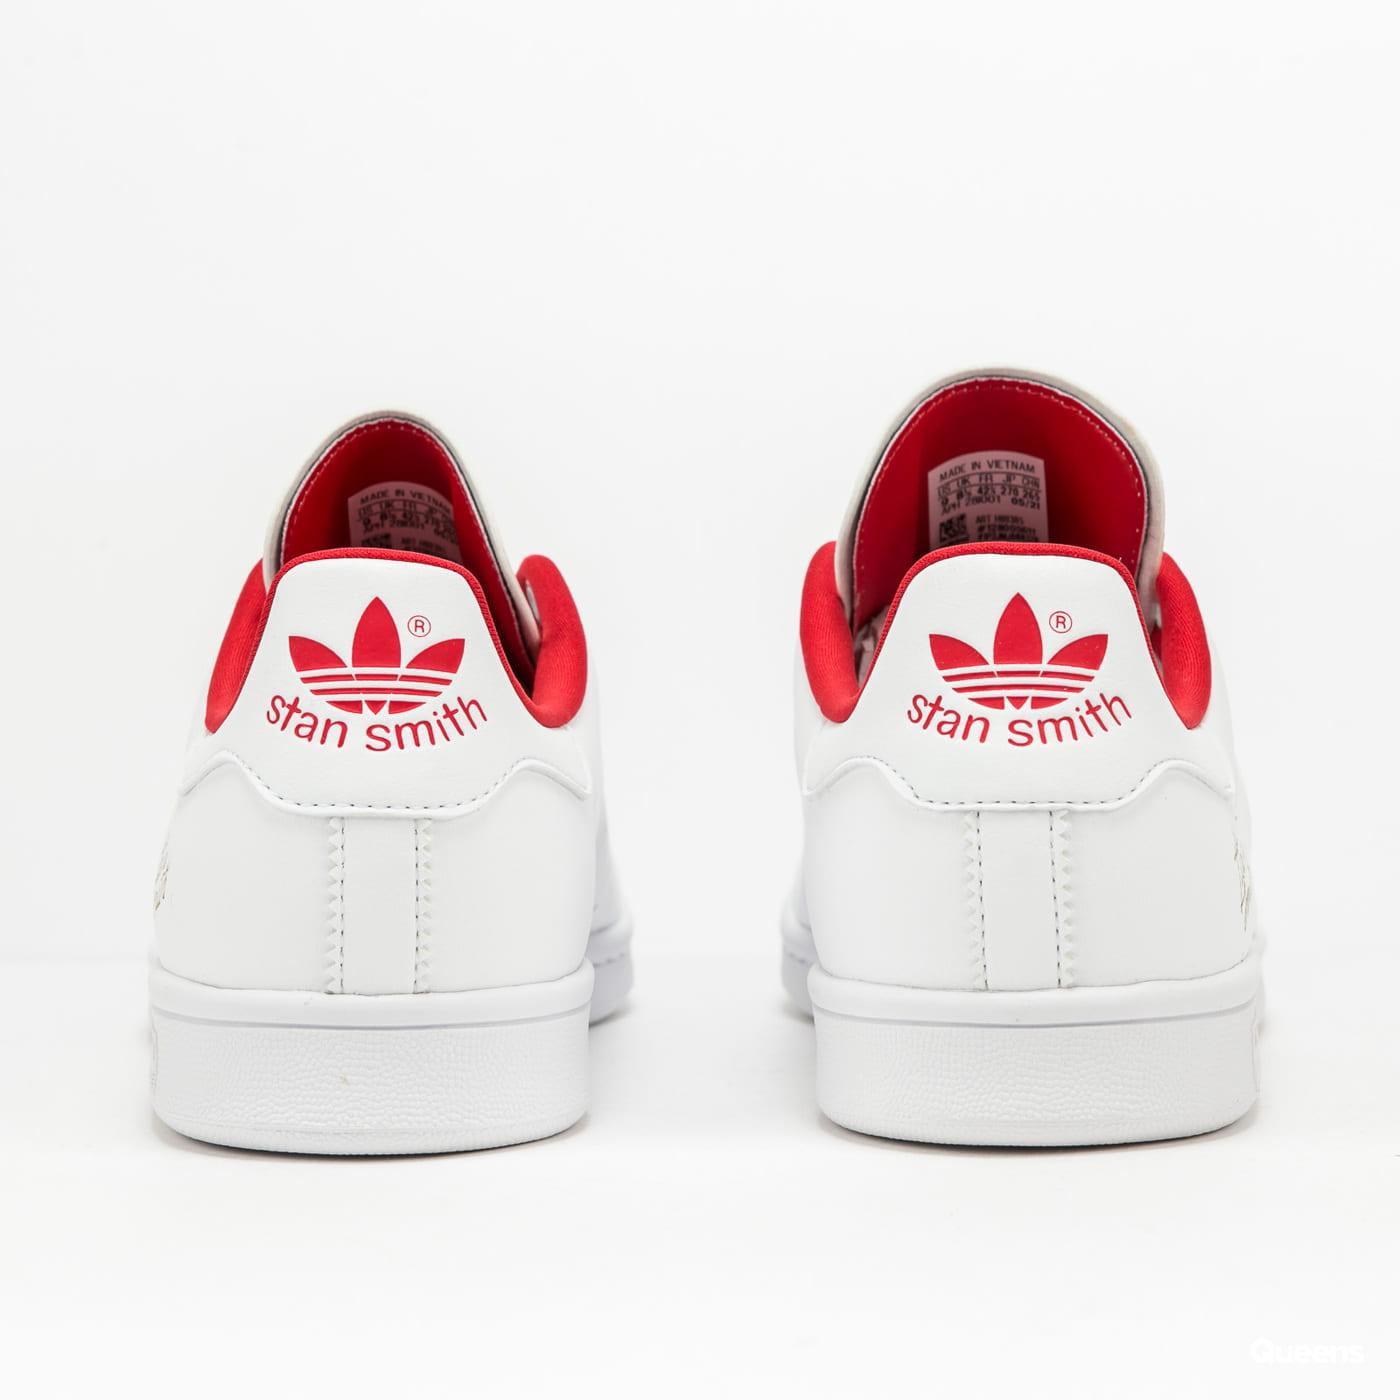 adidas Originals Stan Smith ftwwht / ftwwht / scarlet